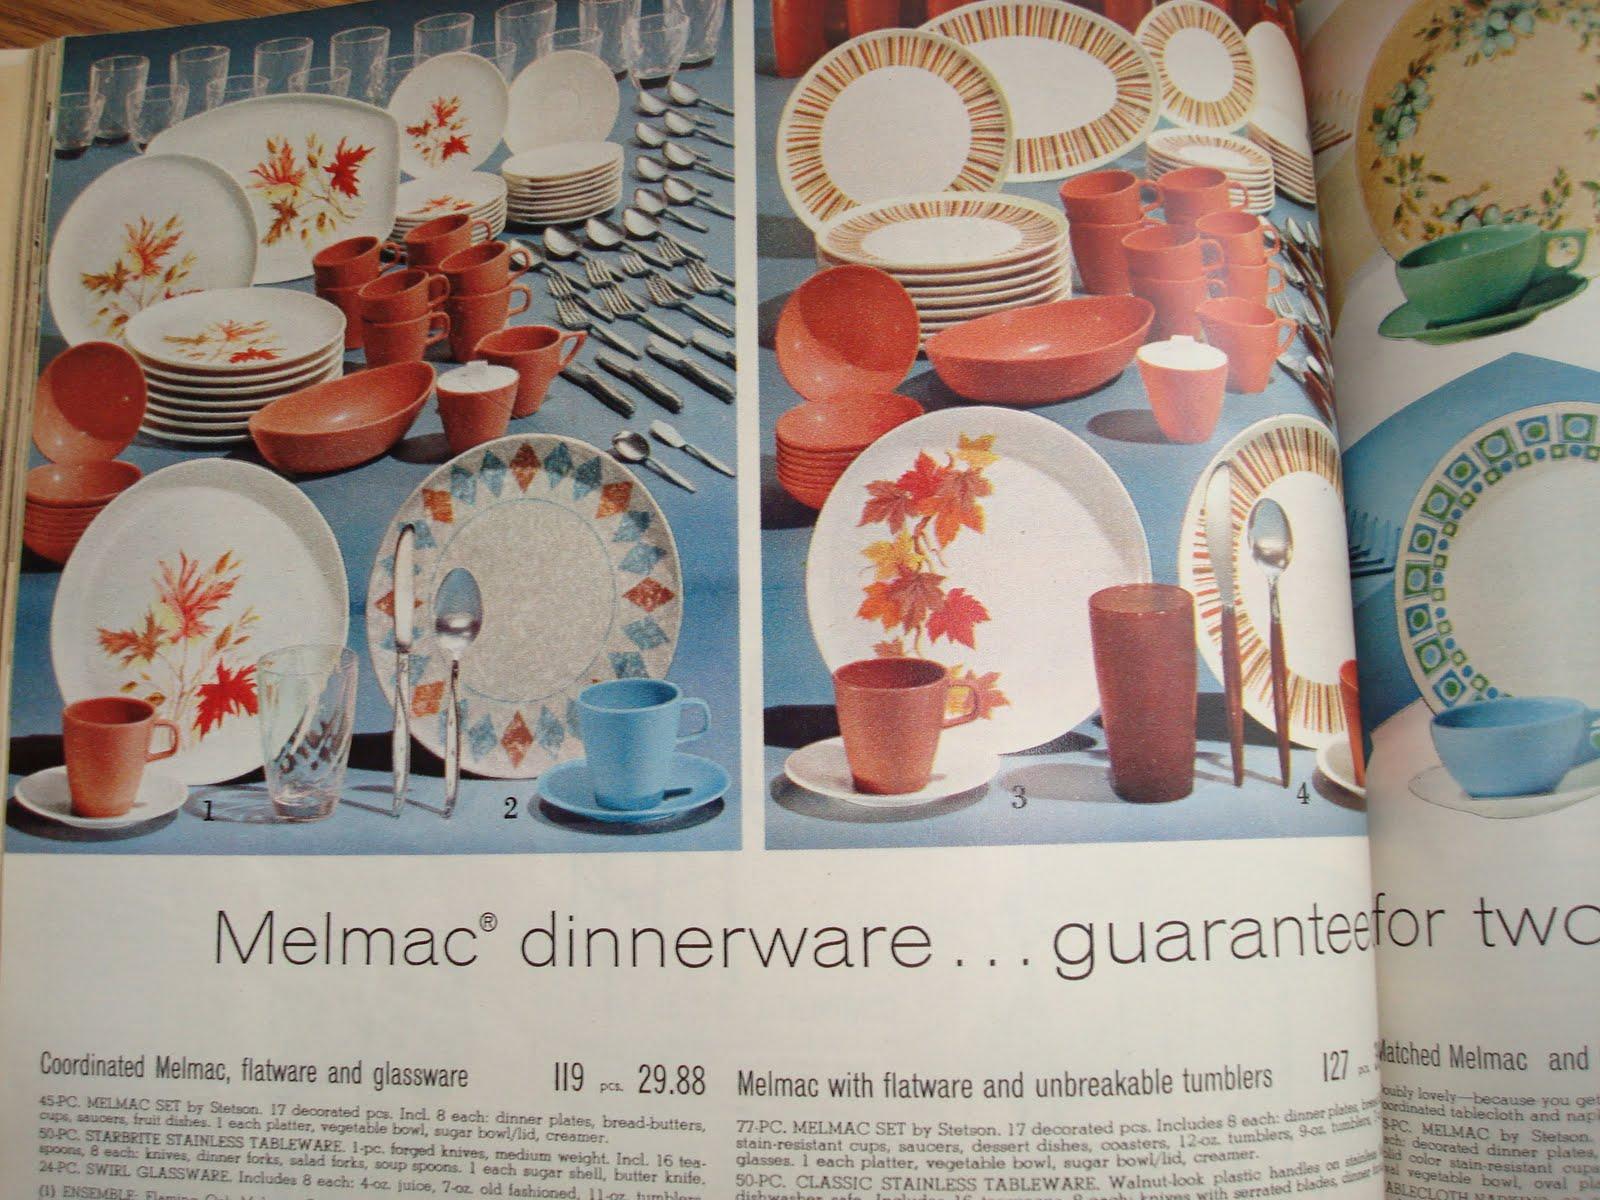 Spiegel Catalog 2011 From 1965 Spiegel Catalog